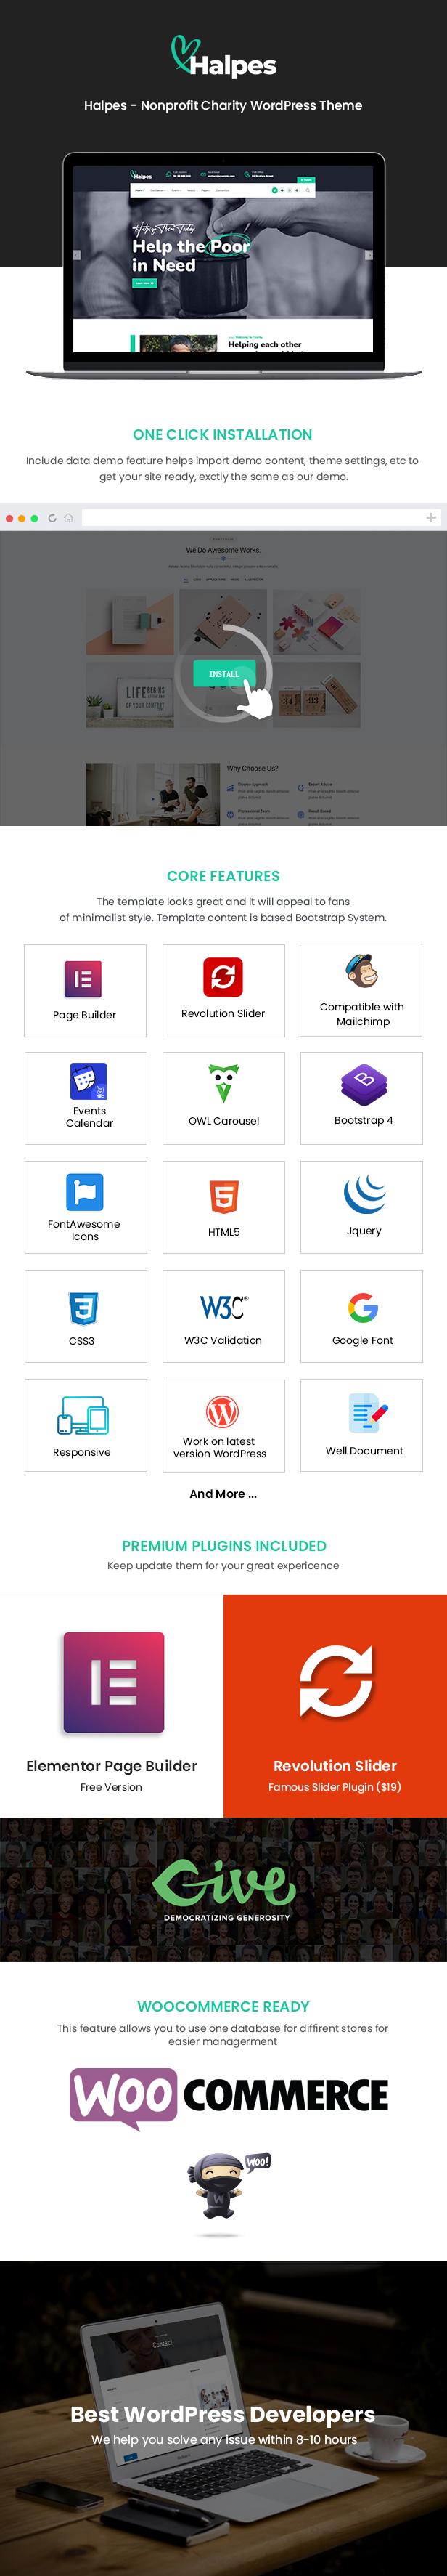 Tema de WordPress de Halpes